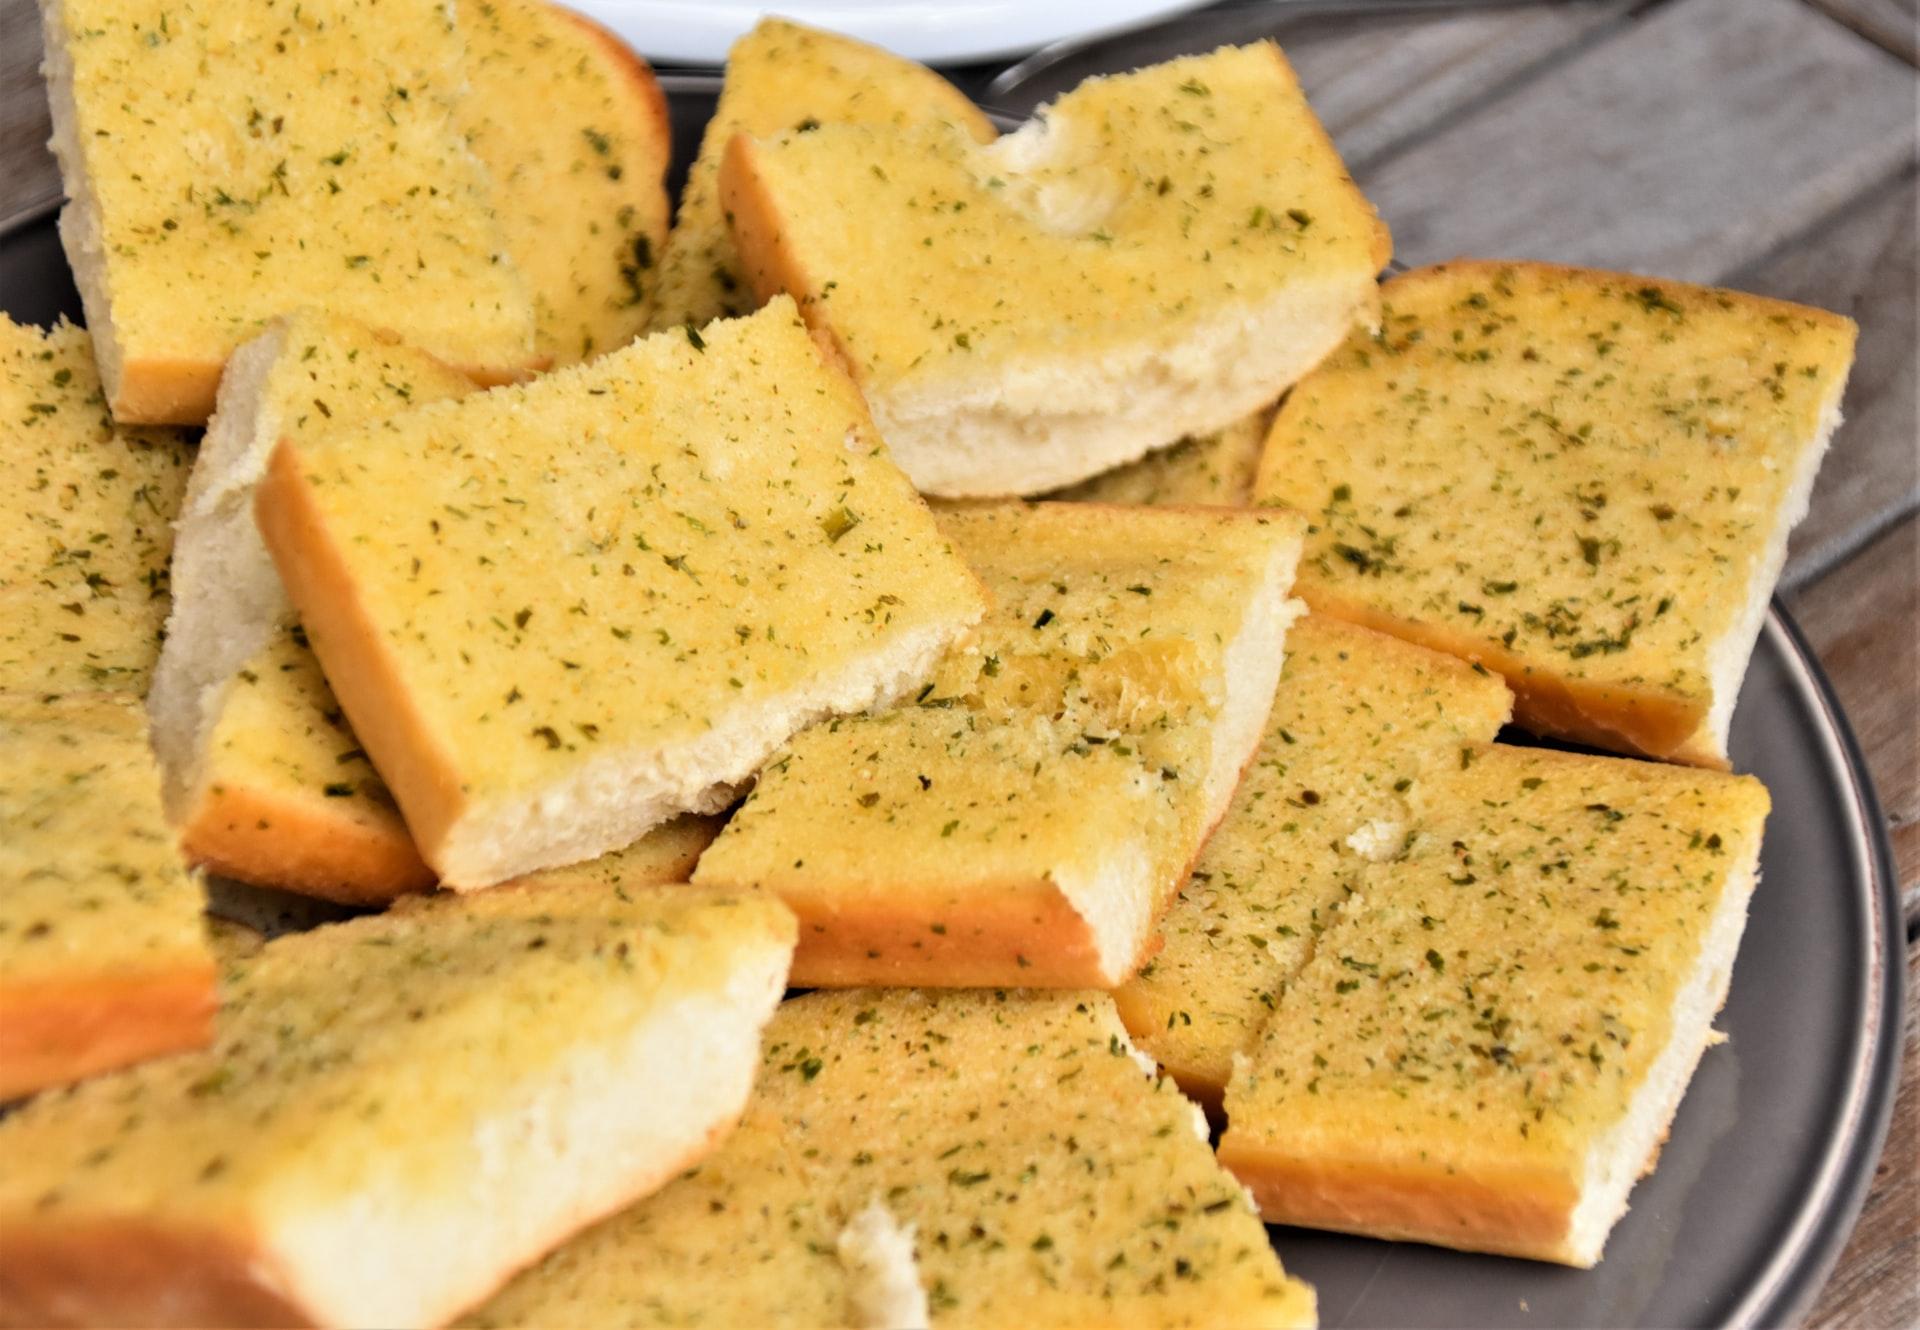 Pane di mais al jalapeno con panna acida